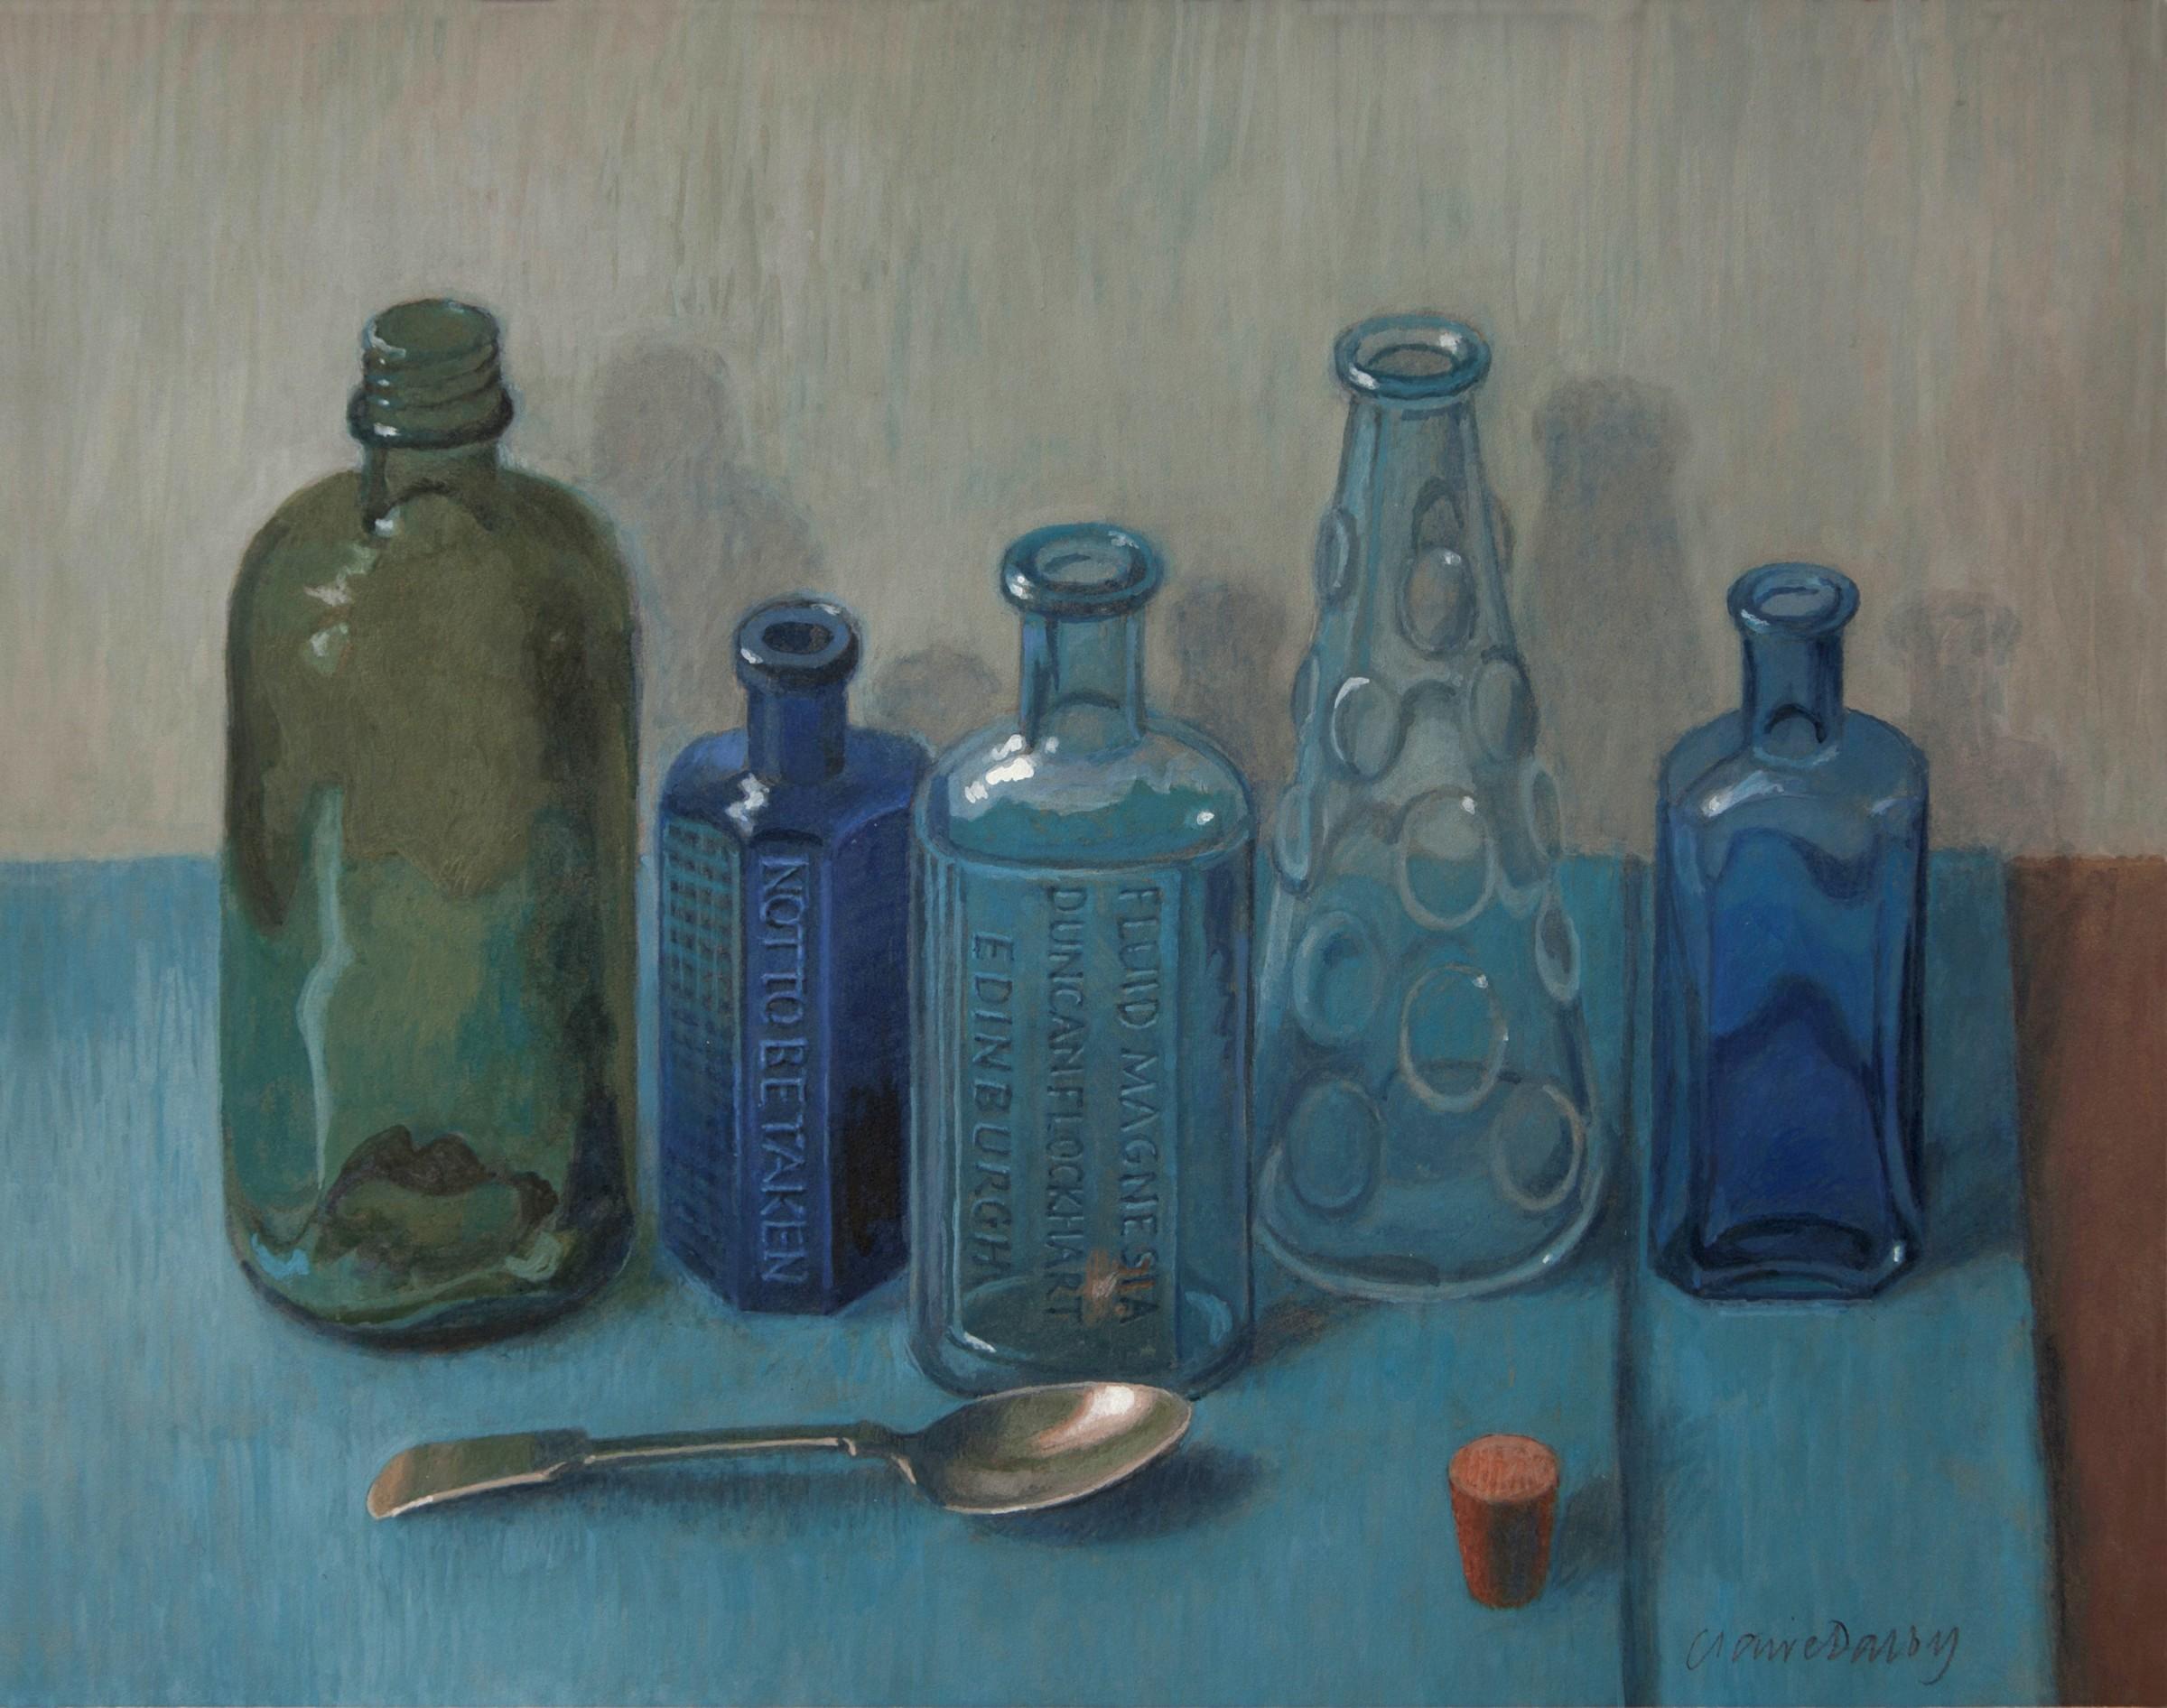 "<span class=""link fancybox-details-link""><a href=""/artists/55-claire-dalby/works/10416-claire-dalby-five-bottles/"">View Detail Page</a></span><div class=""artist""><span class=""artist""><strong>Claire Dalby</strong></span></div><div class=""title""><em>Five Bottles</em></div><div class=""medium"">watercolour & gouache</div><div class=""price"">£1,600.00</div>"